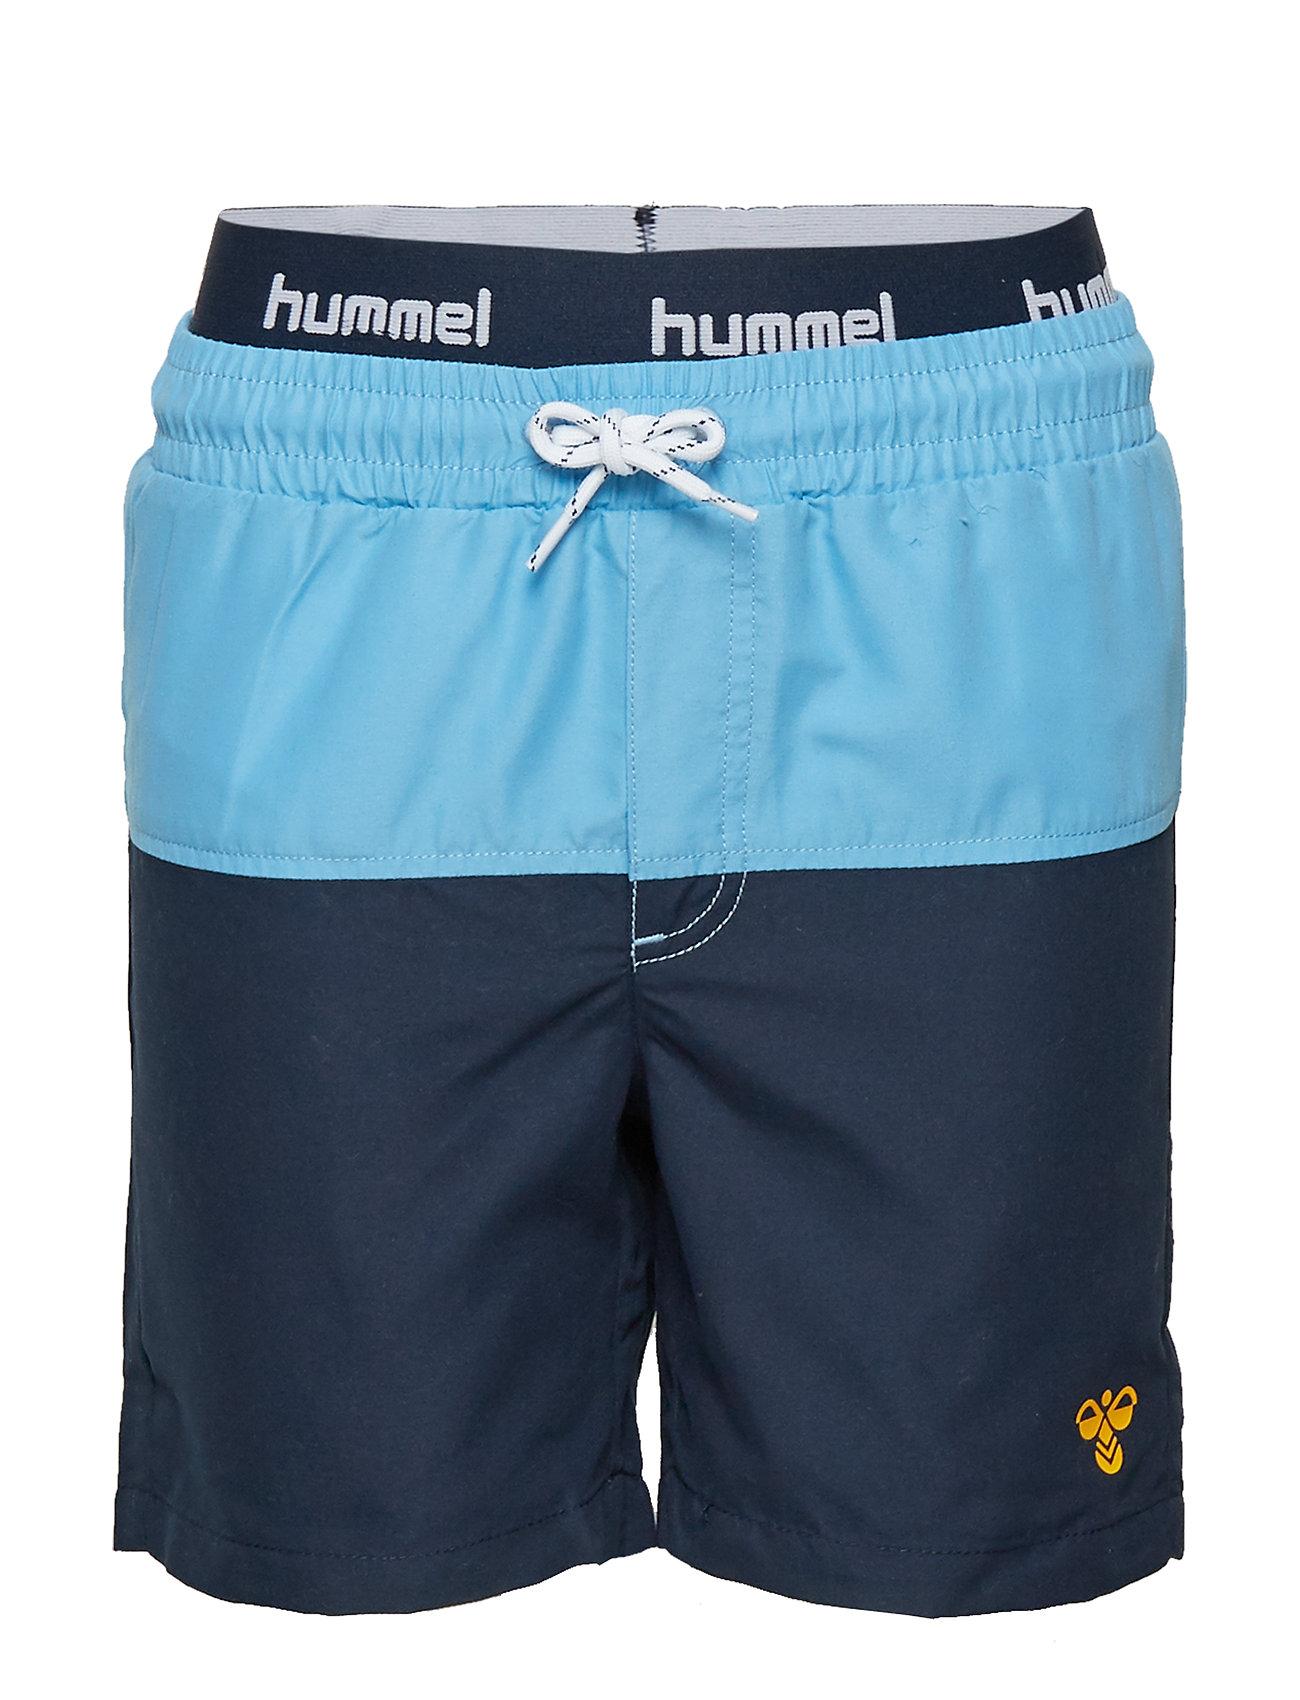 Hummel HMLSPOT BOARD SHORTS - BLACK IRIS